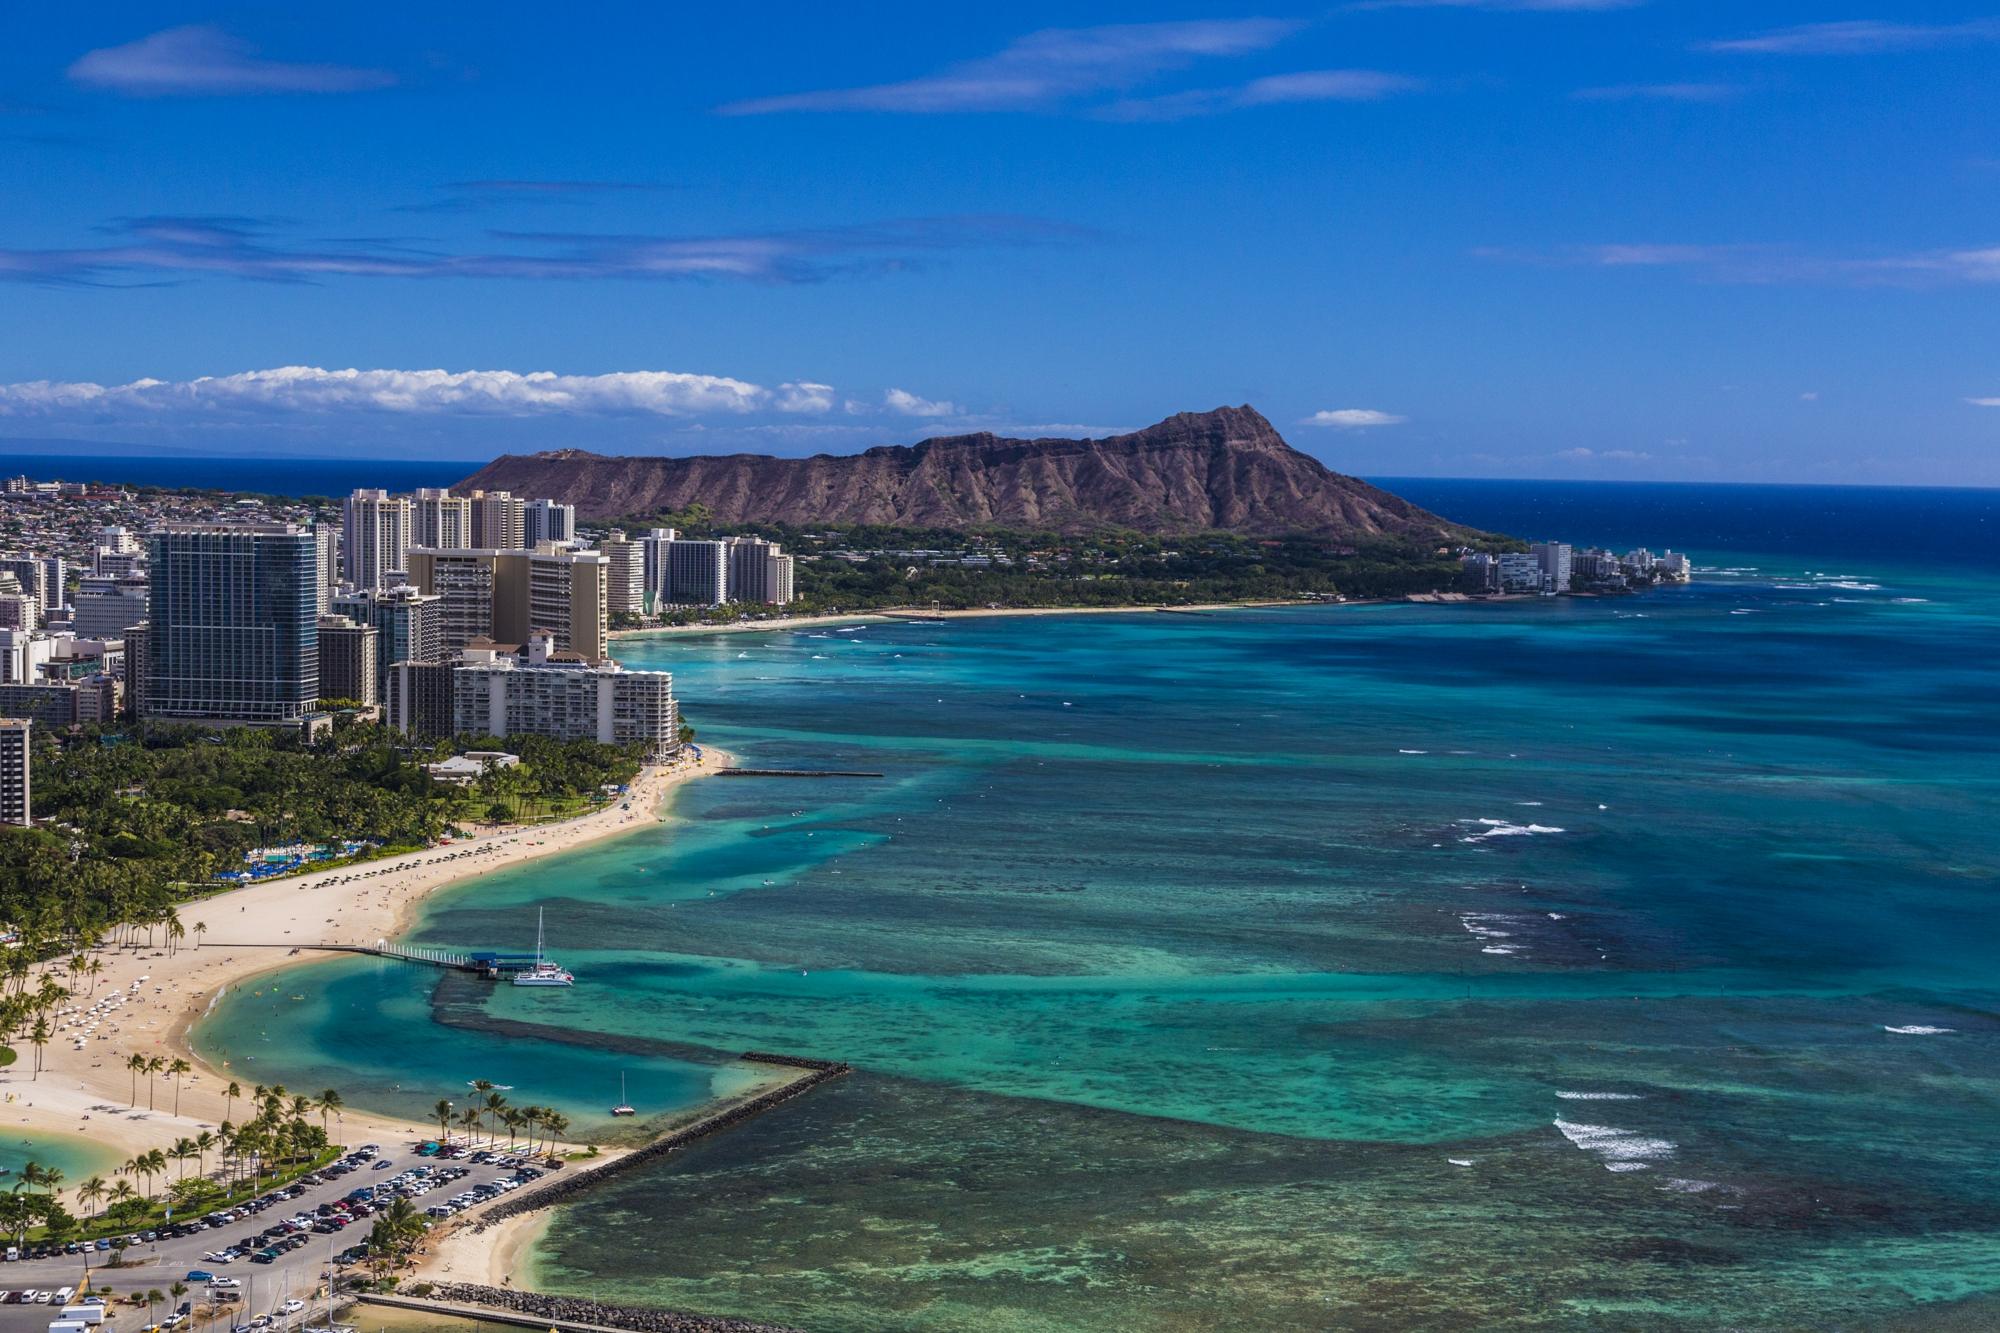 Hawaii-Tourism-Diamond-Head-View